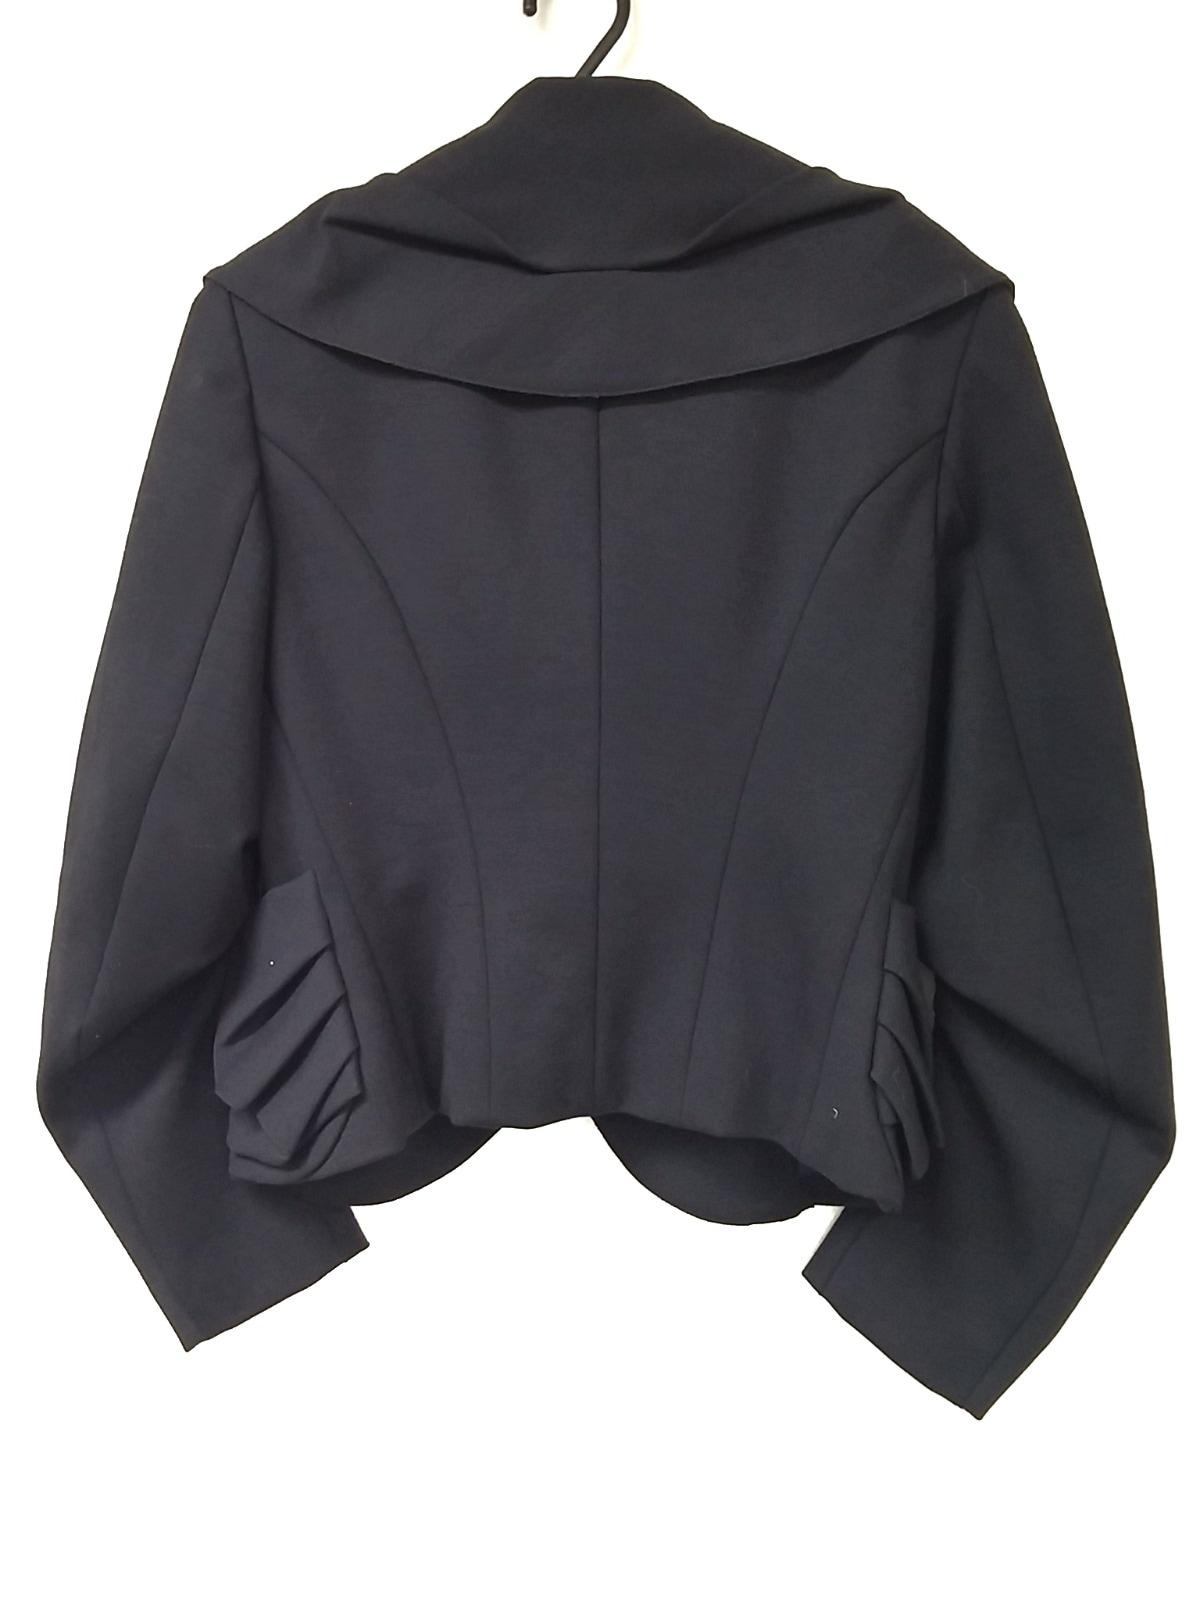 DONNAKARAN(ダナキャラン)のジャケット